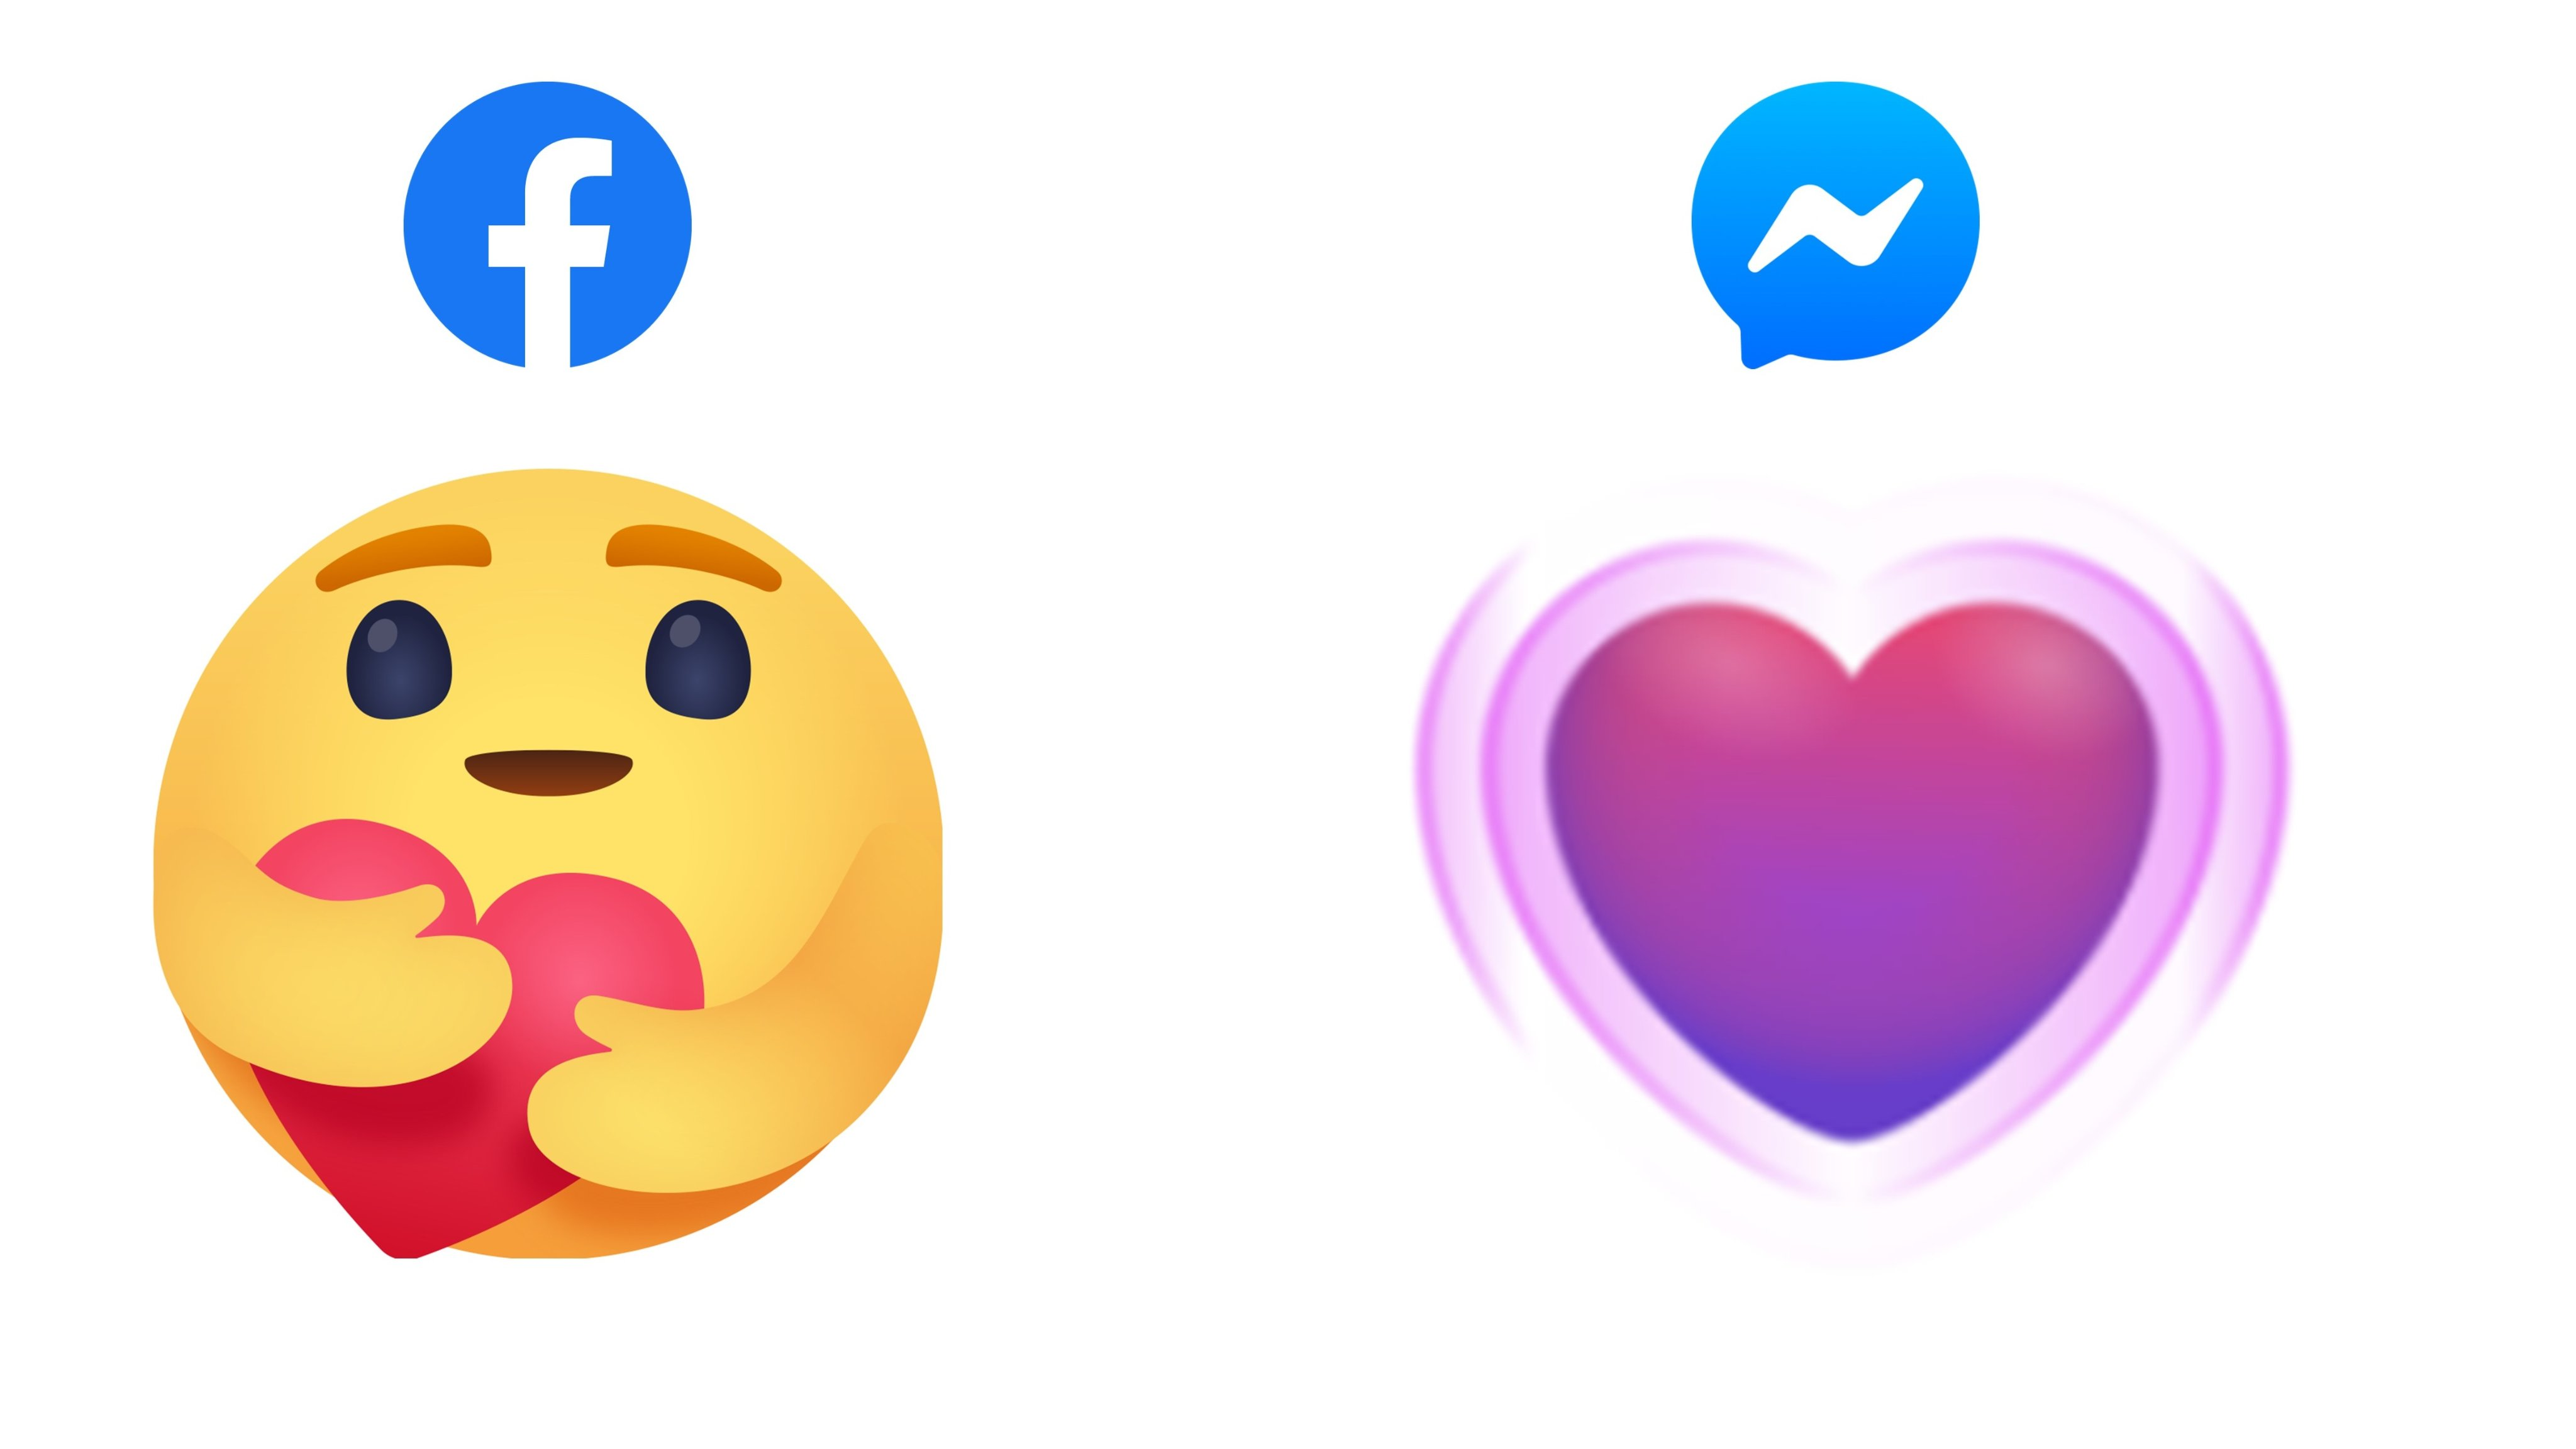 Facebook Adding a New 'Care' Reaction Amid Coronavirus Pandemic